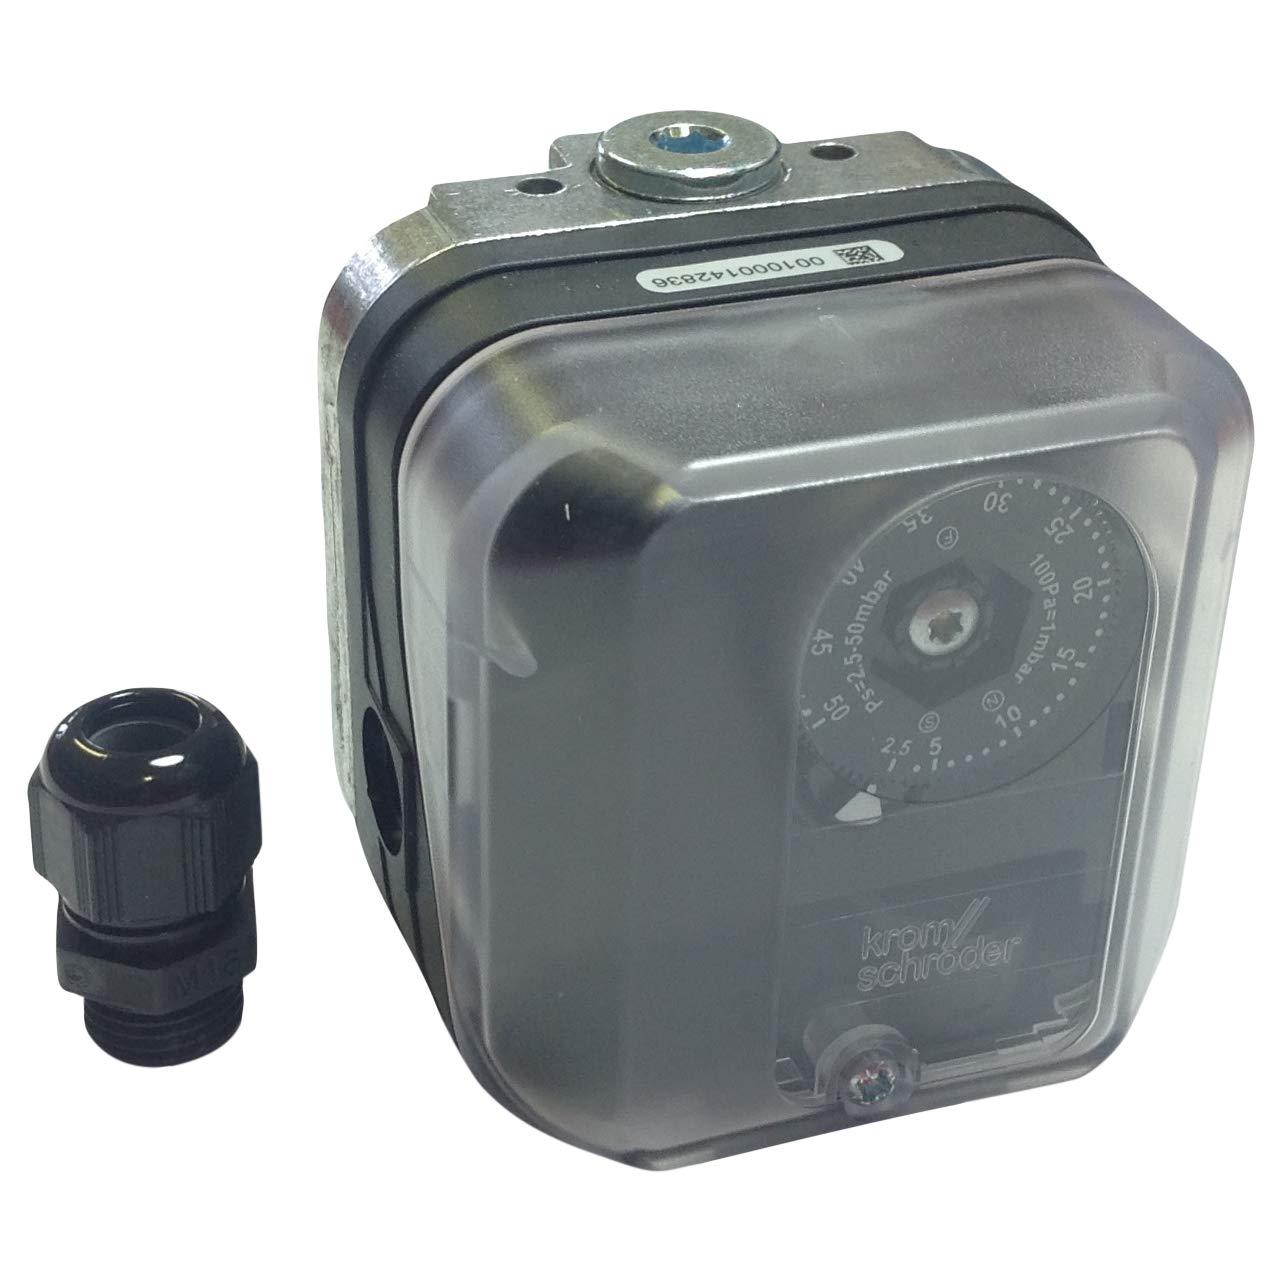 Differential Pressure 84447350//84447352 DG 50U-3 Switch KROMSCHRODER Gas Press DG50U-3 DGU50U-3//84447350 84447350 50MBAR